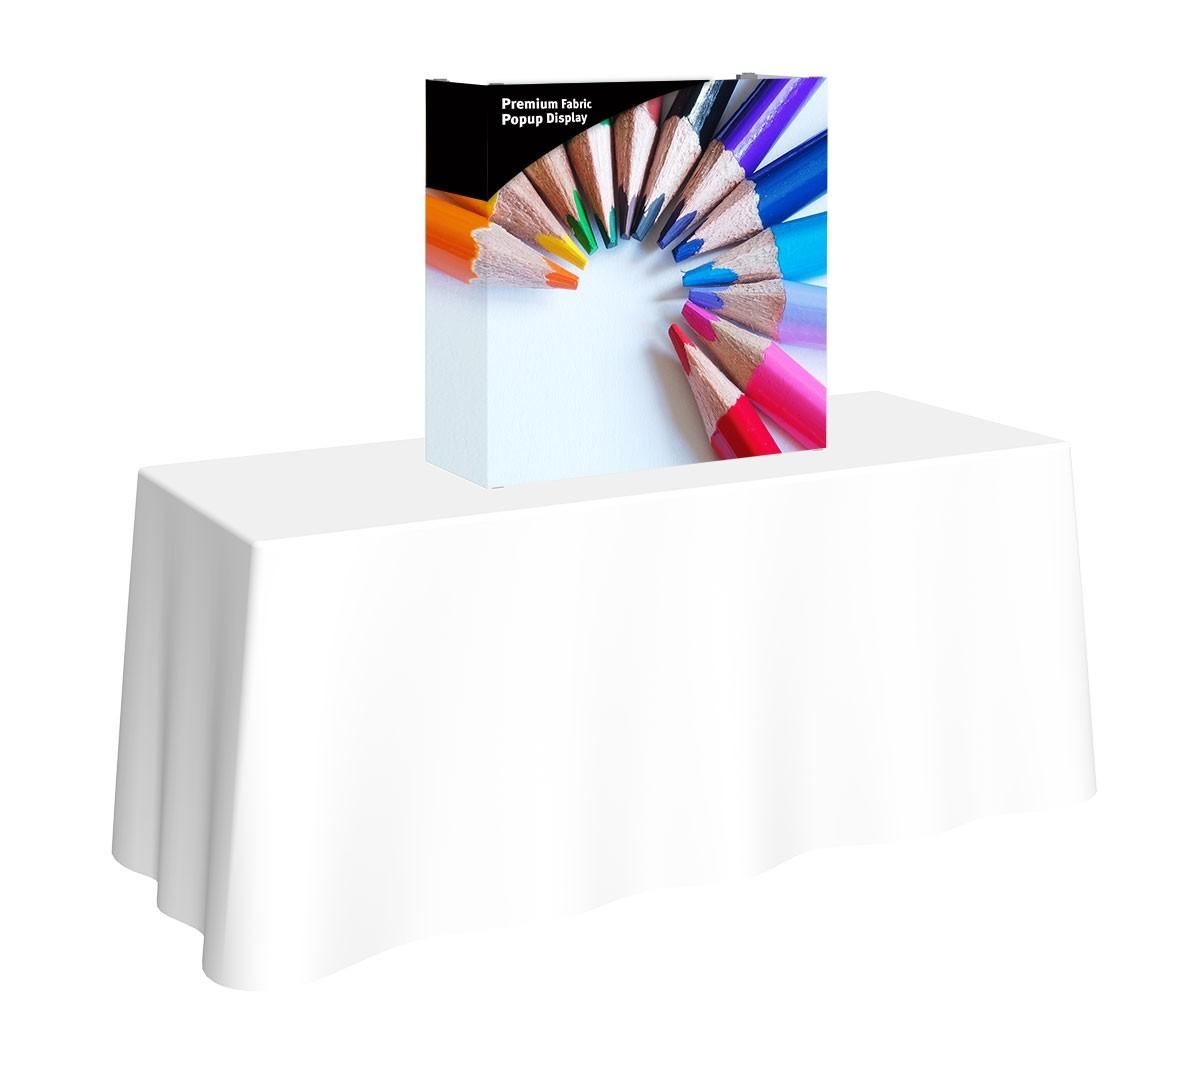 Premium Fabric Popup 2.5' Table Top Display